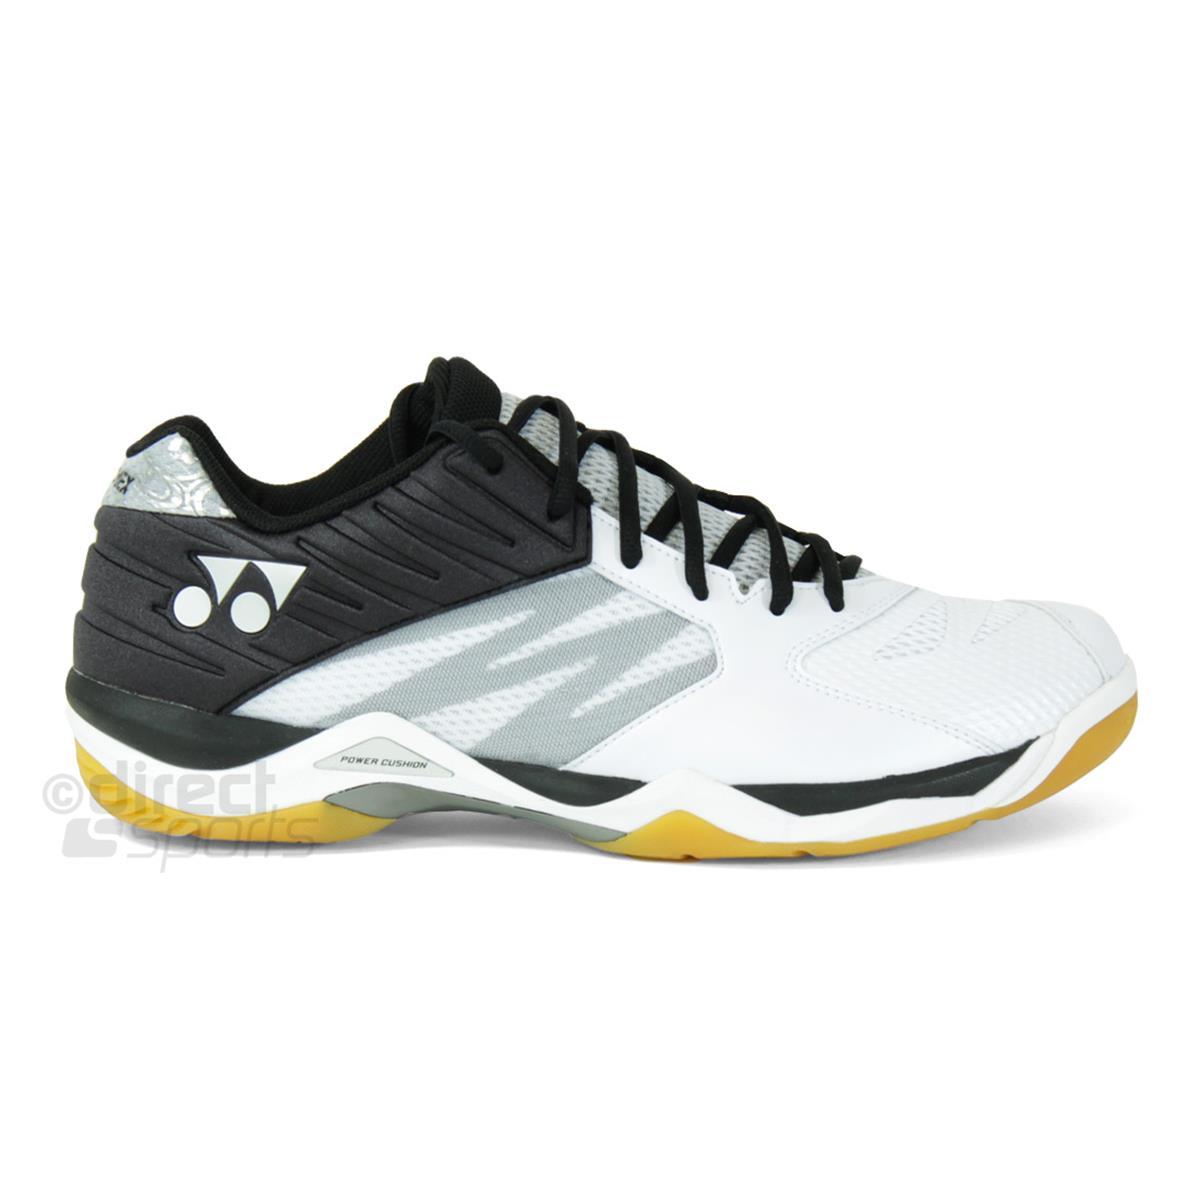 b645c3ea1b9 Yonex Power Cushion Comfort ZM Badminton Shoes (White ...